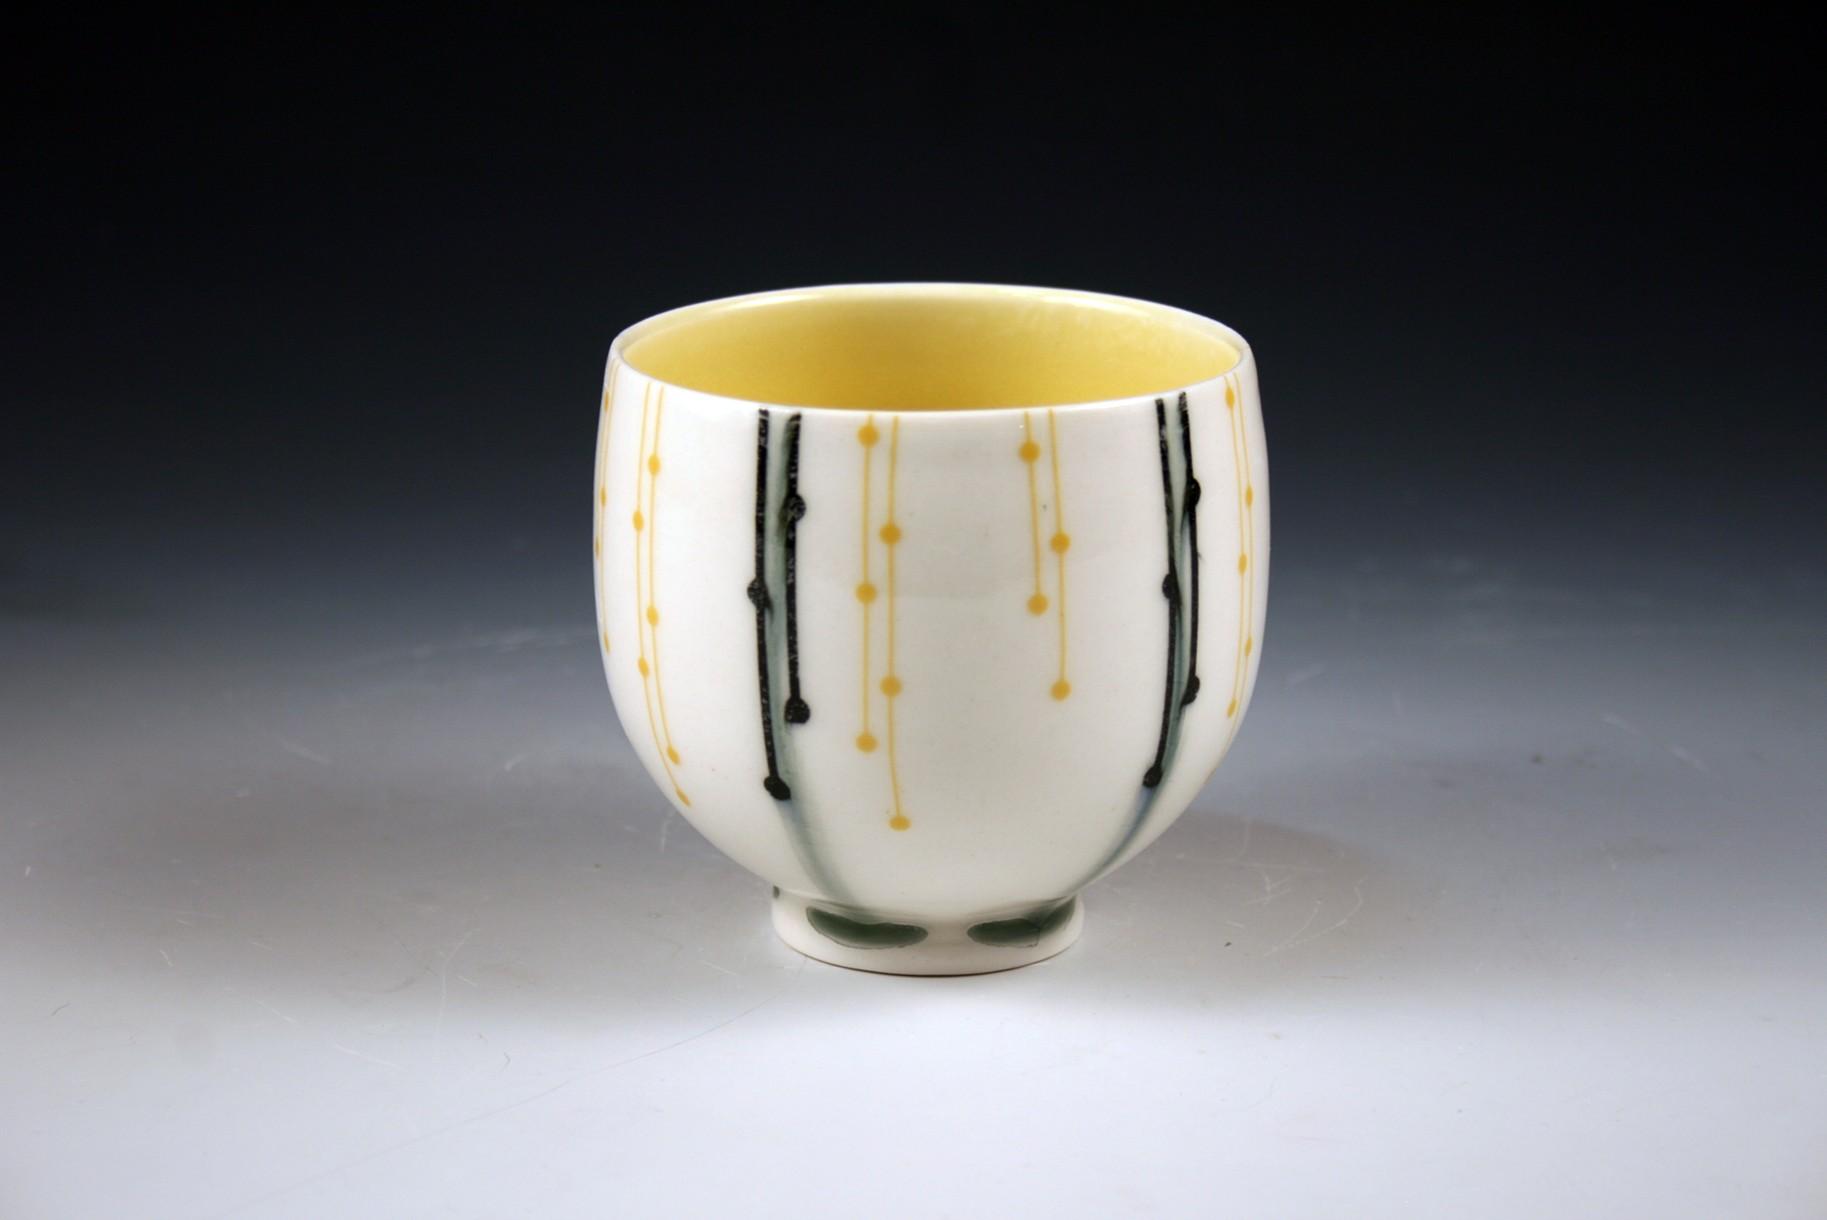 Porcelain slip cast cups with underglaze and overglaze decals